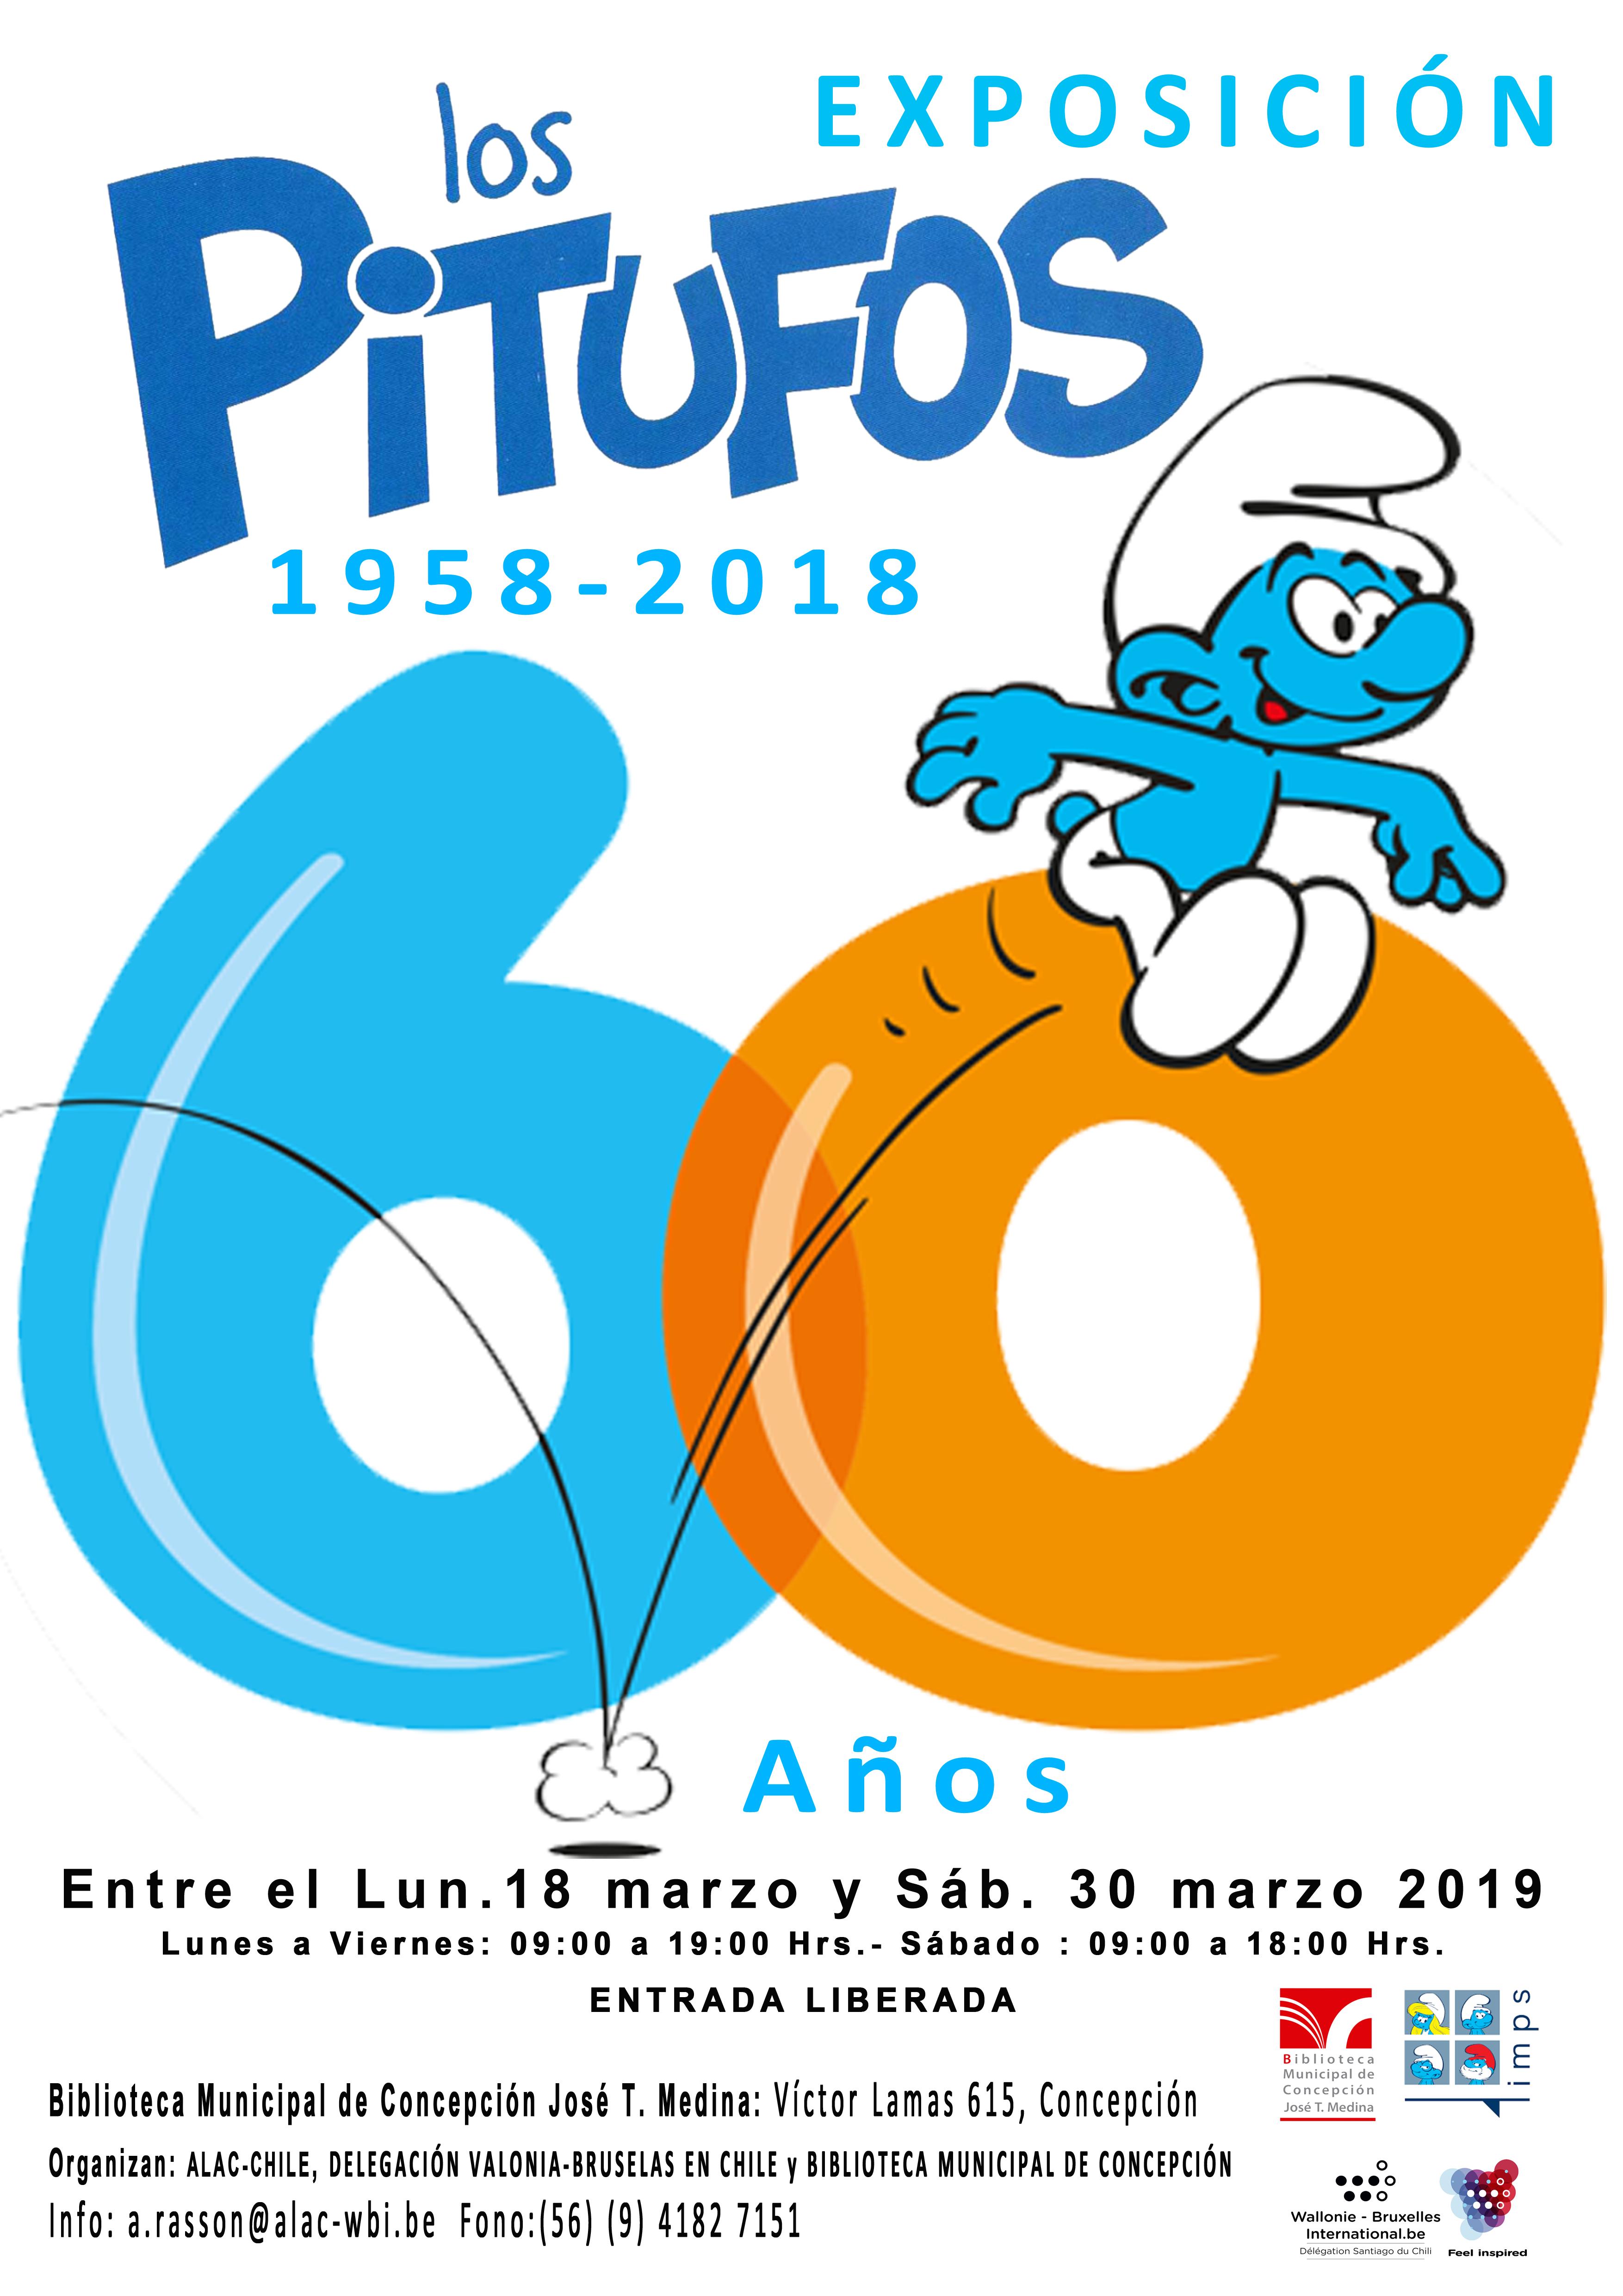 afiche-expo-pitufos-en-biblioteca-de-concepci%c2%a6n